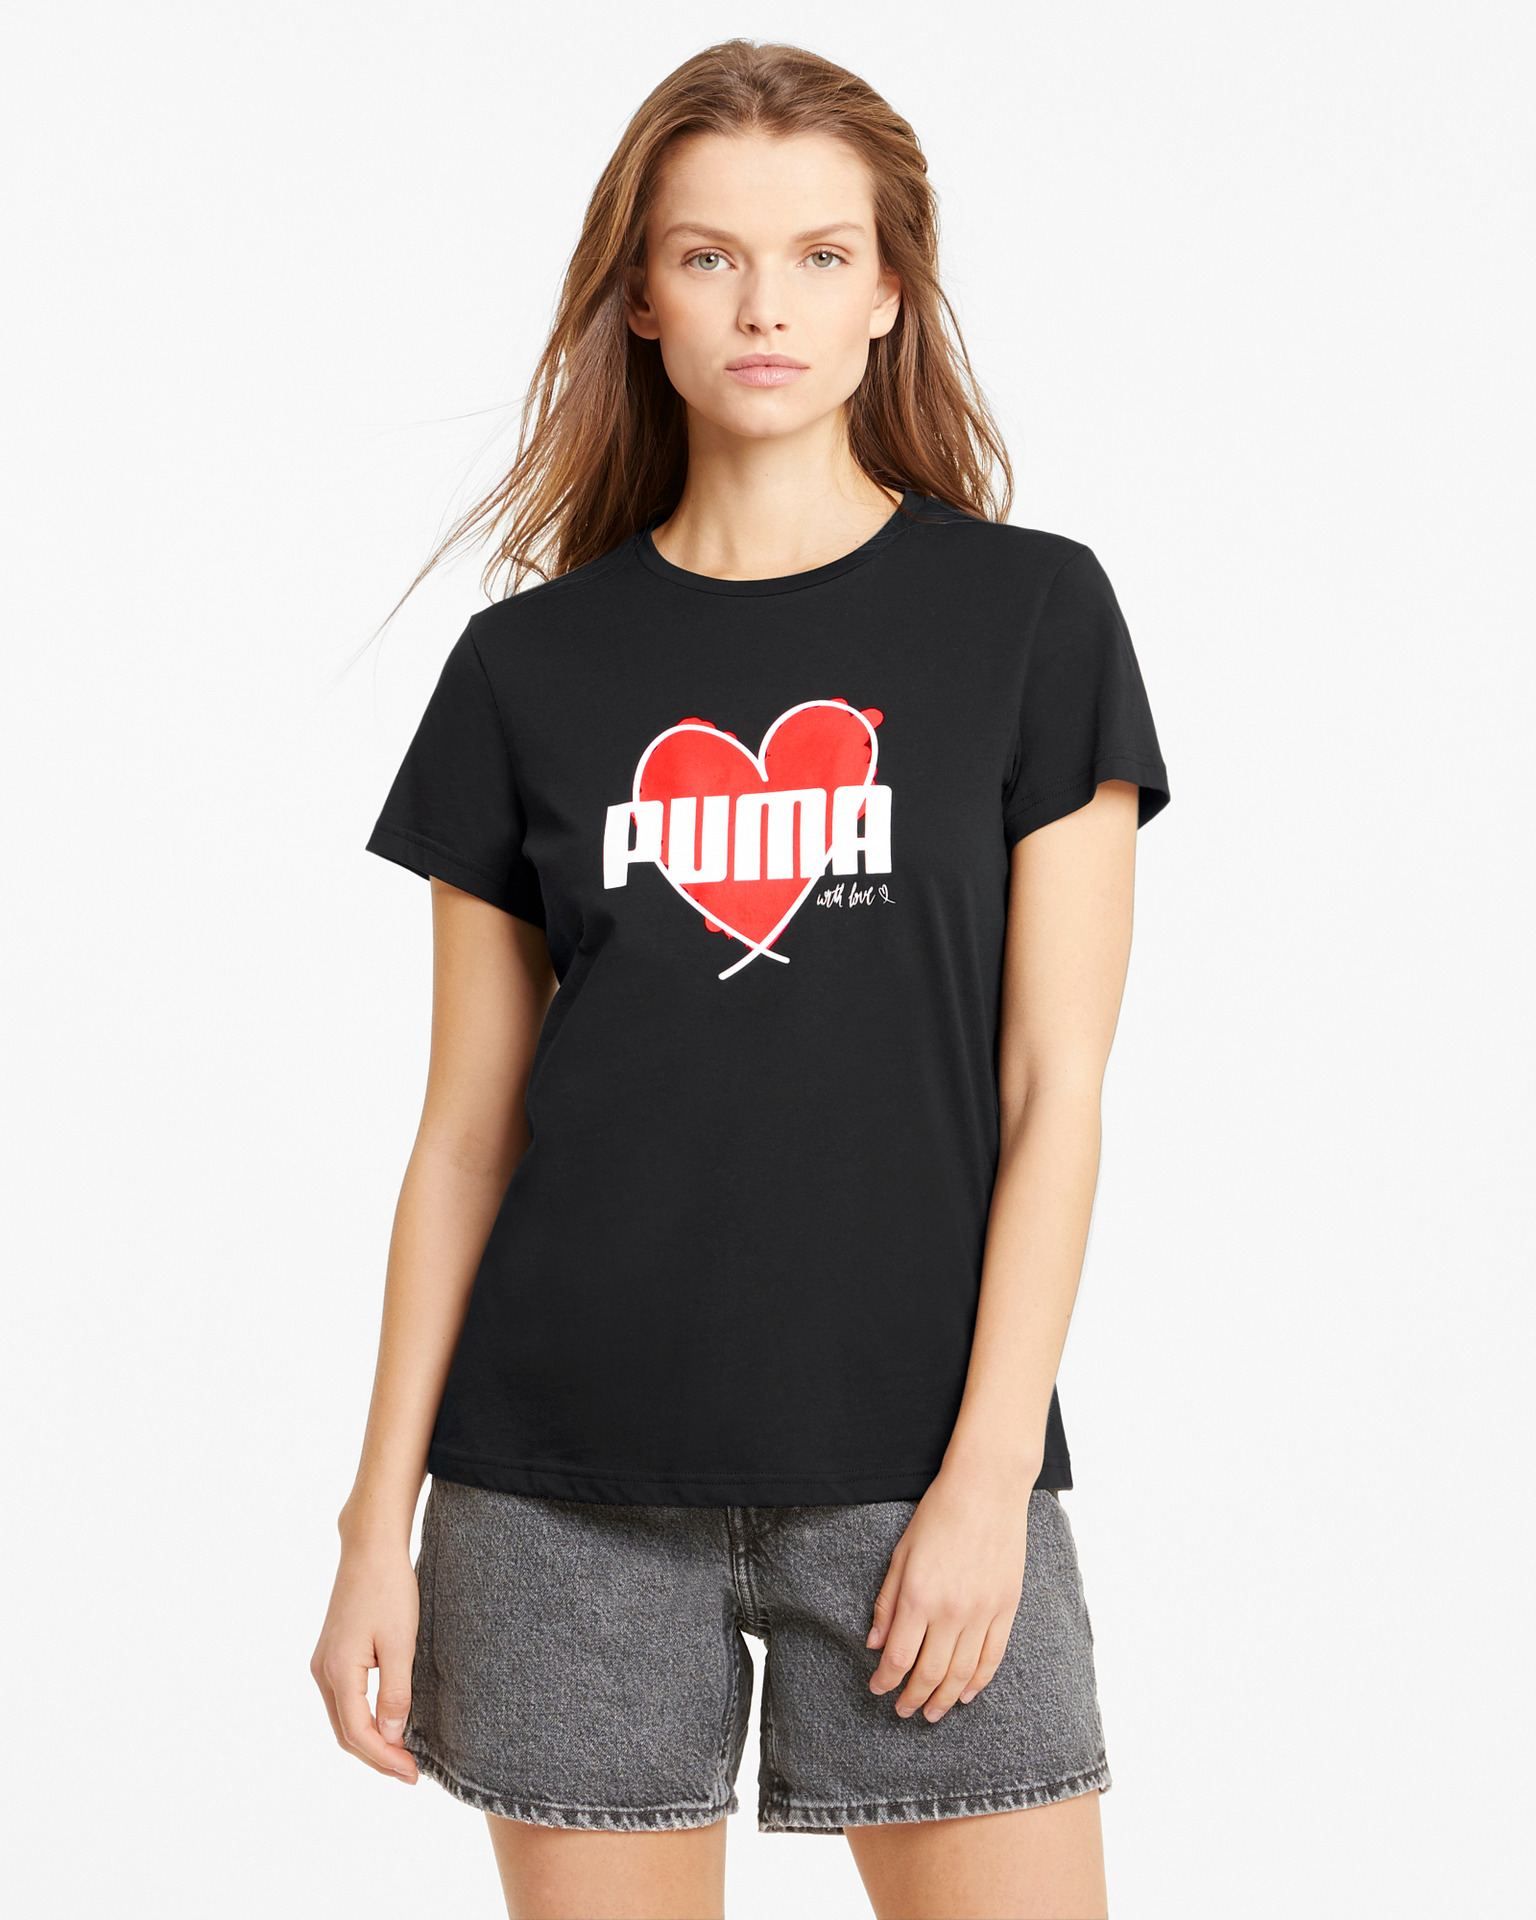 Puma čierne dámske tričko Heart - M